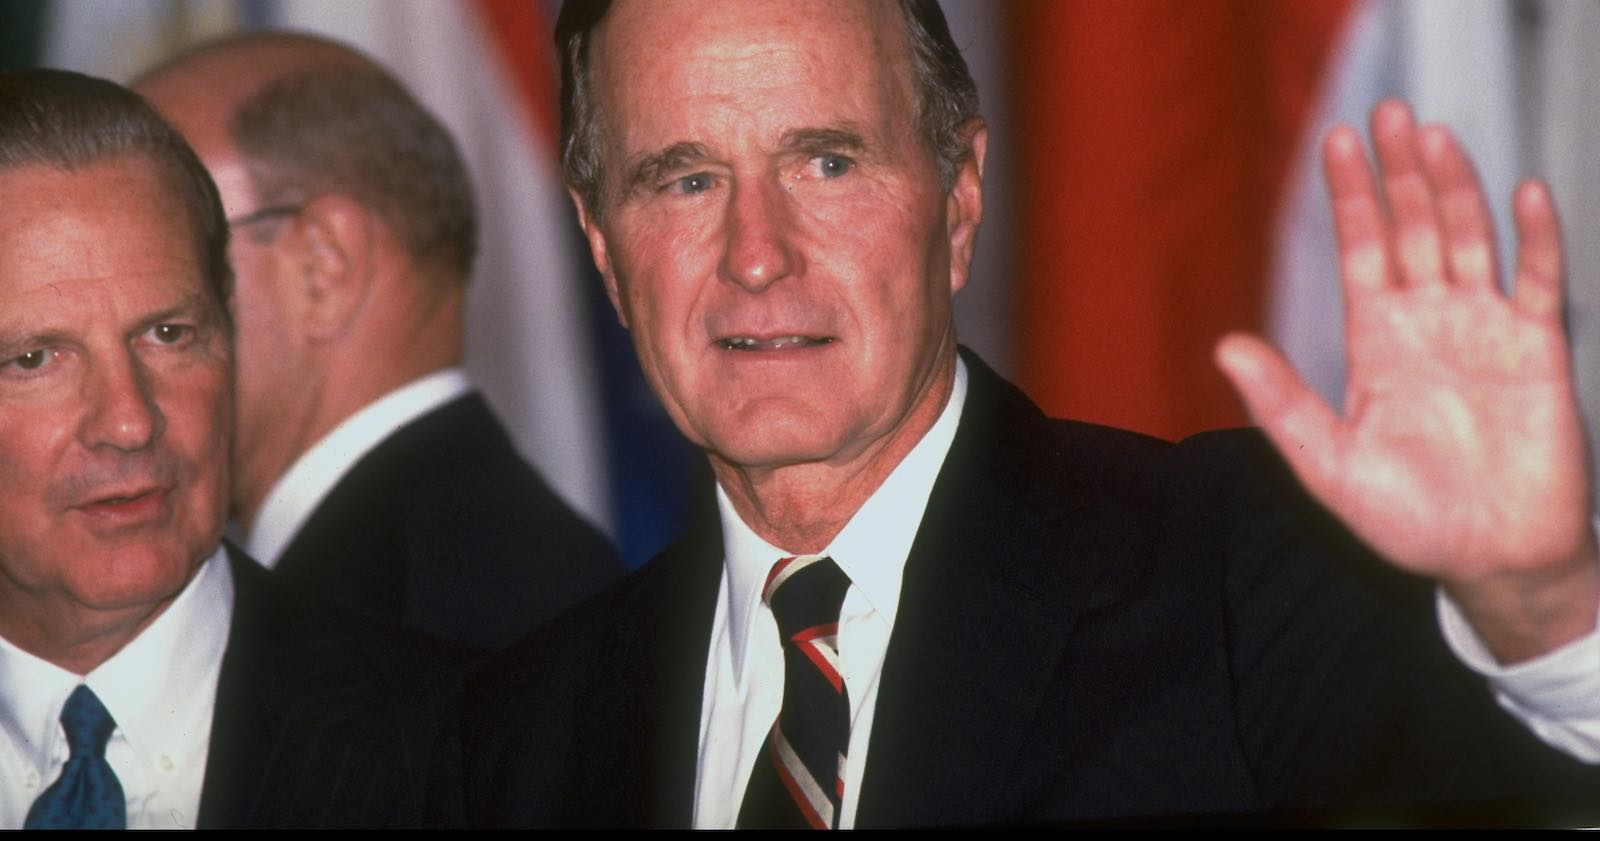 George H. W. Bush, 1989 (Photo: Diana Walker via Getty)